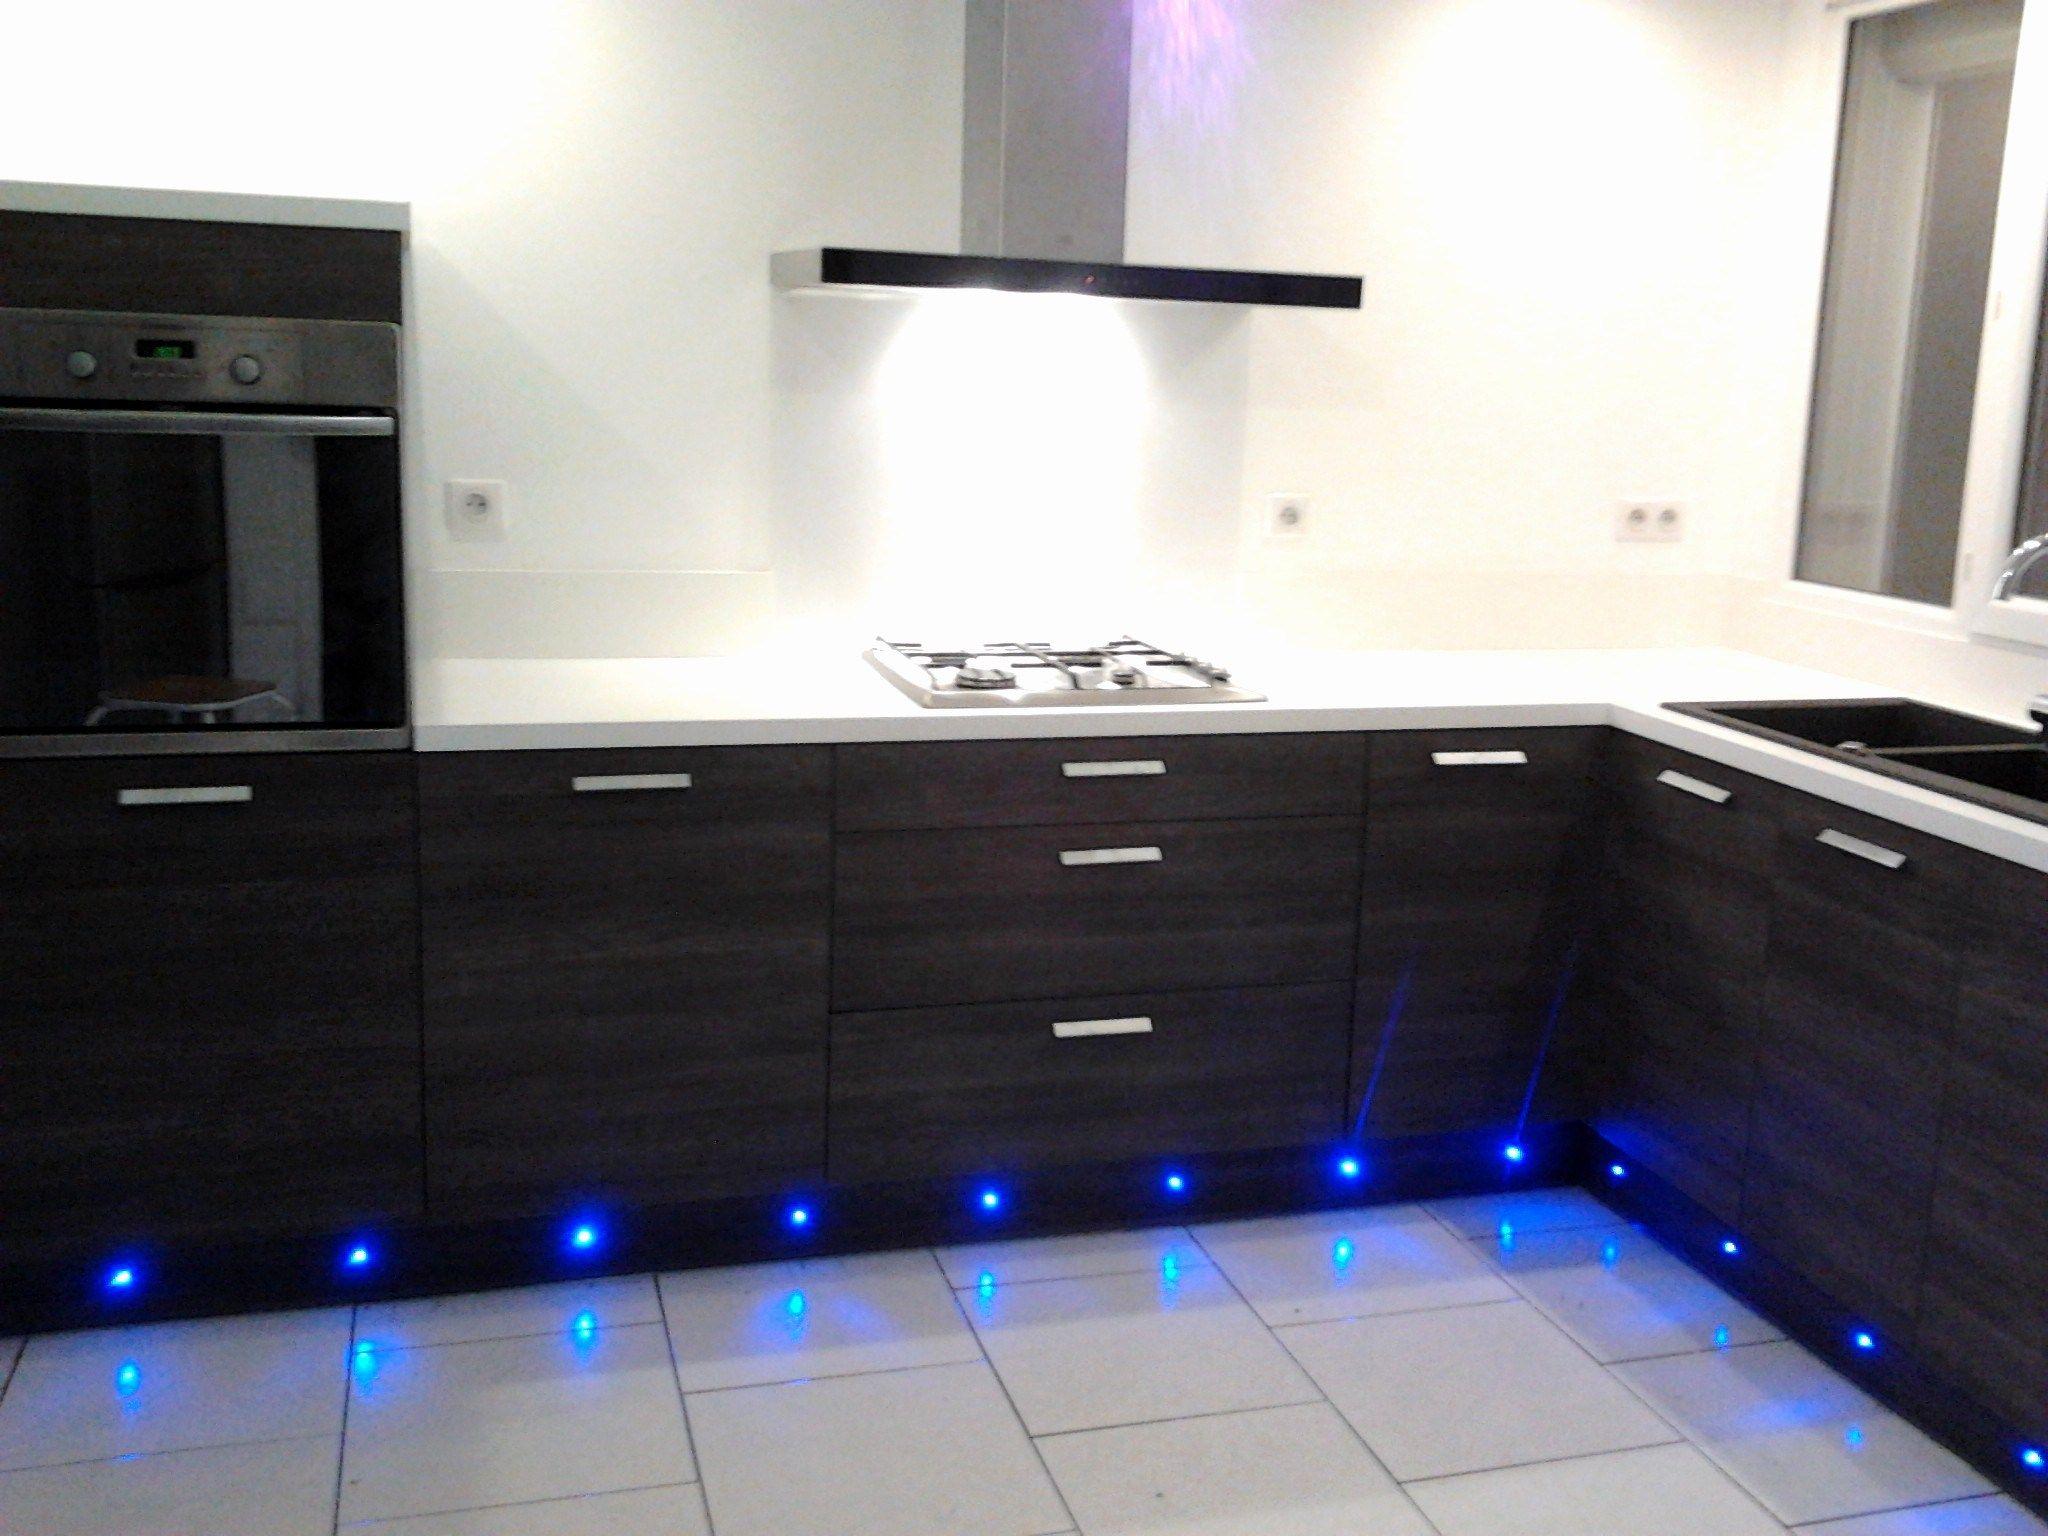 Beautiful Brico Depot Bleu De Travail Home Decor Styles Design Kitchen Design